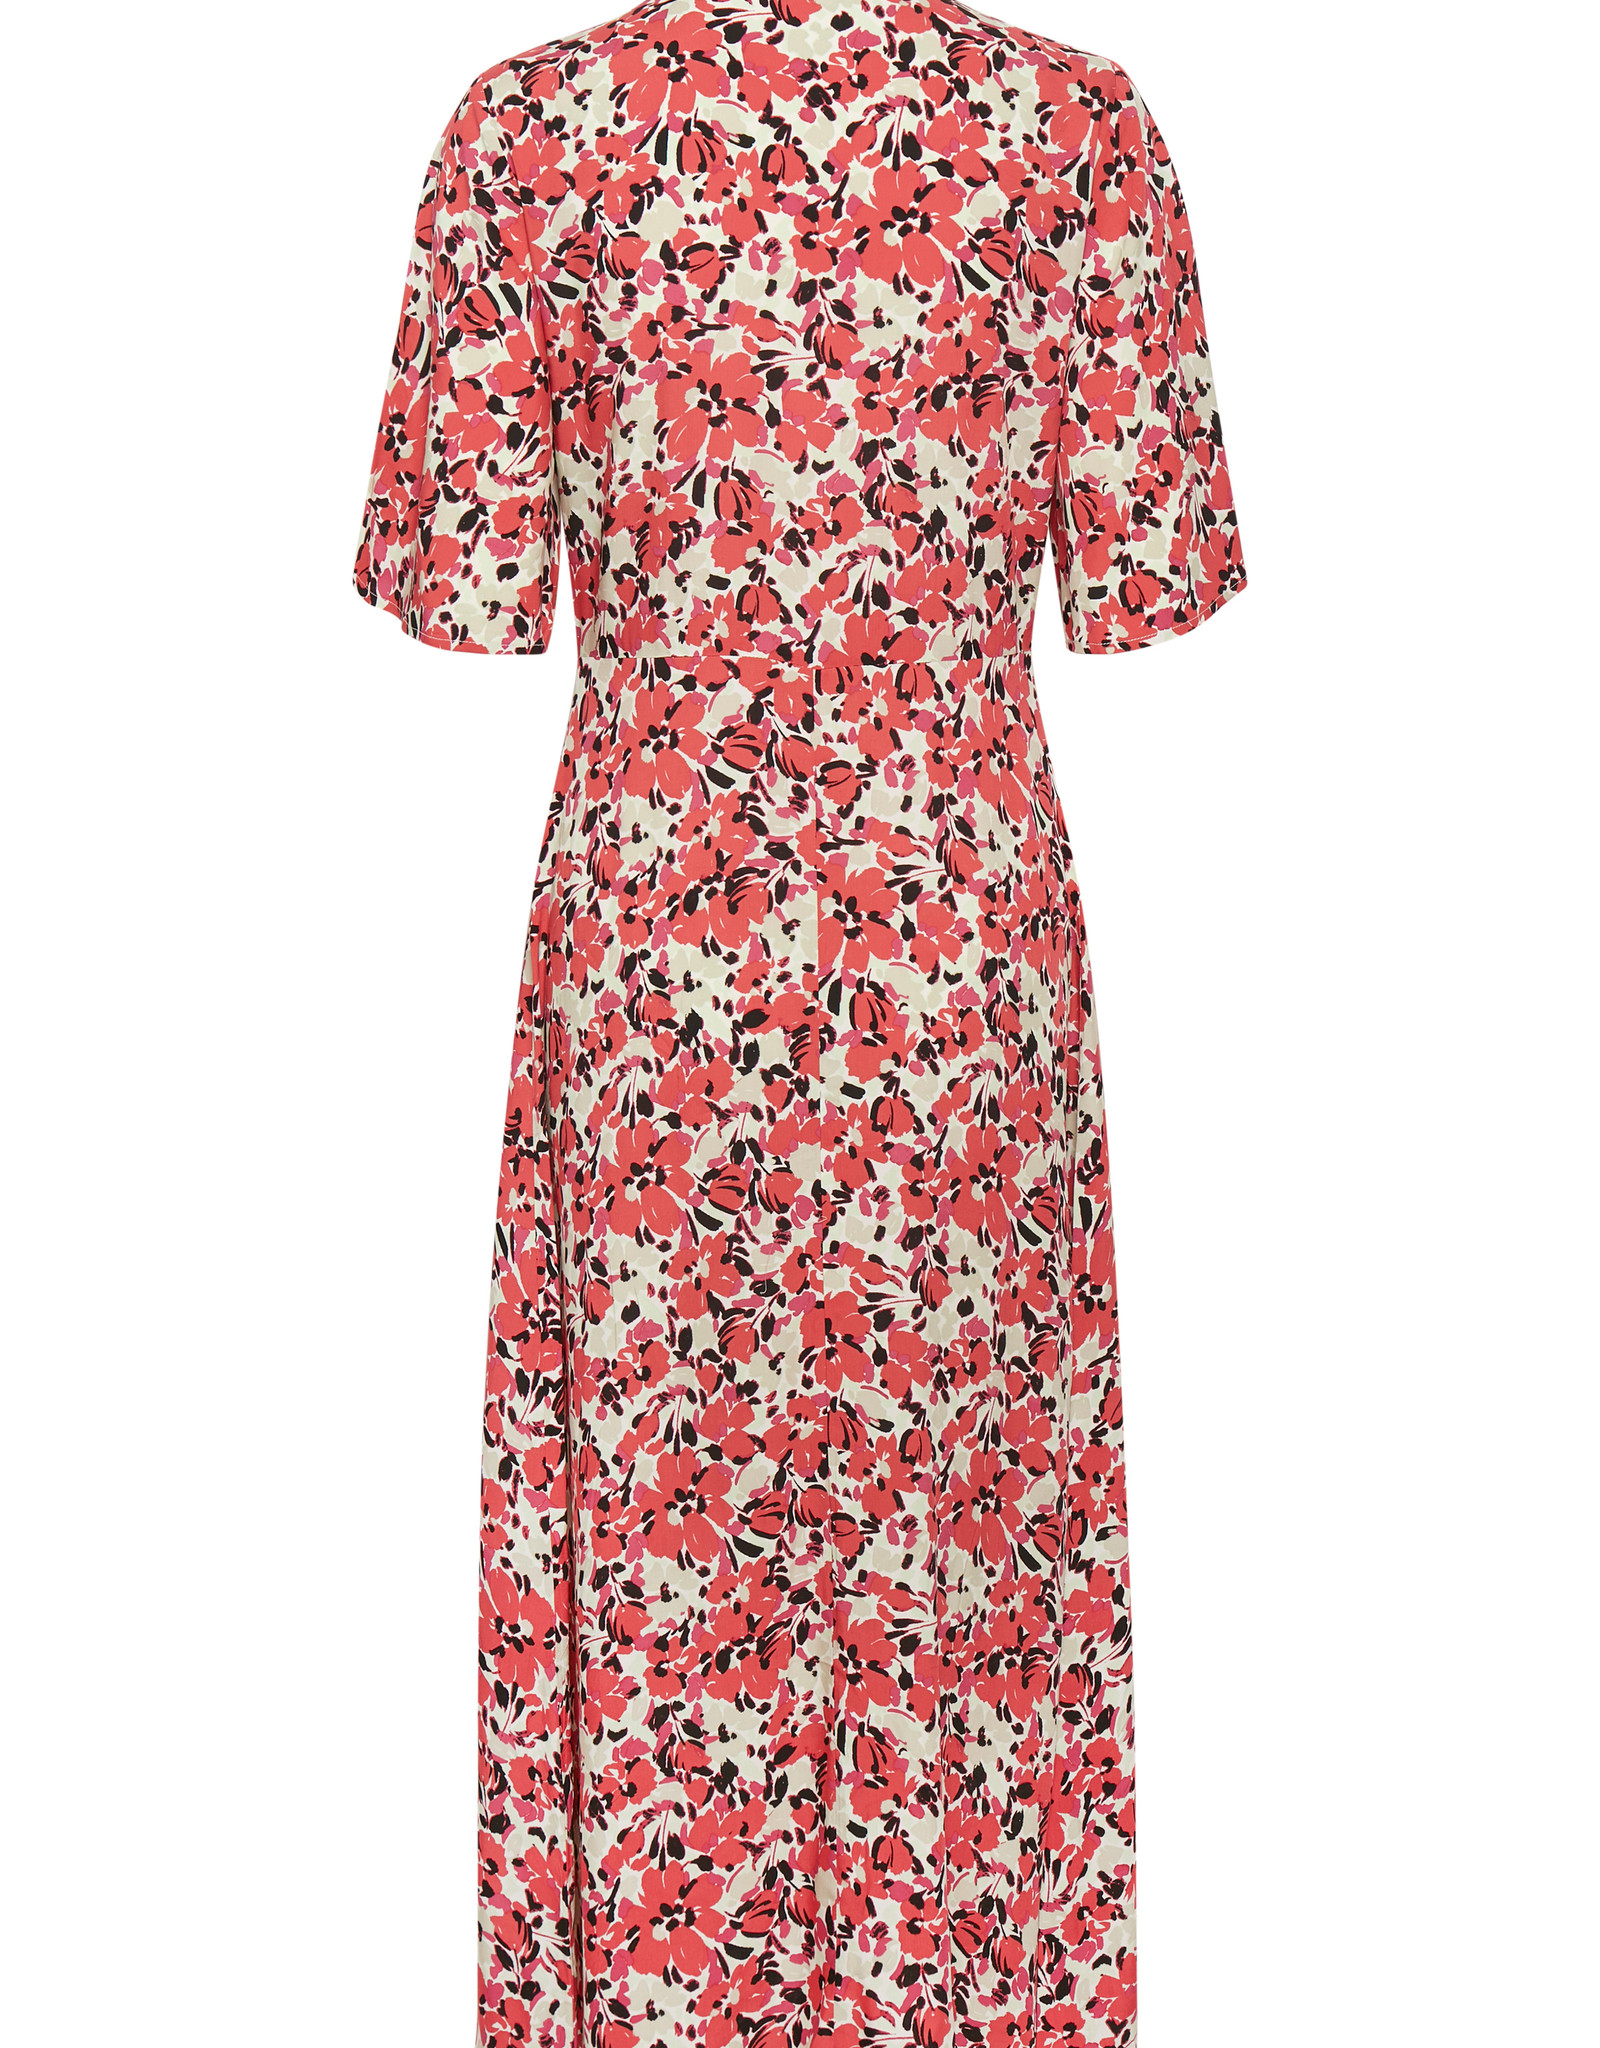 Soaked in Luxury Indiana Rafina Shirt Dress Multifloral Cardinal